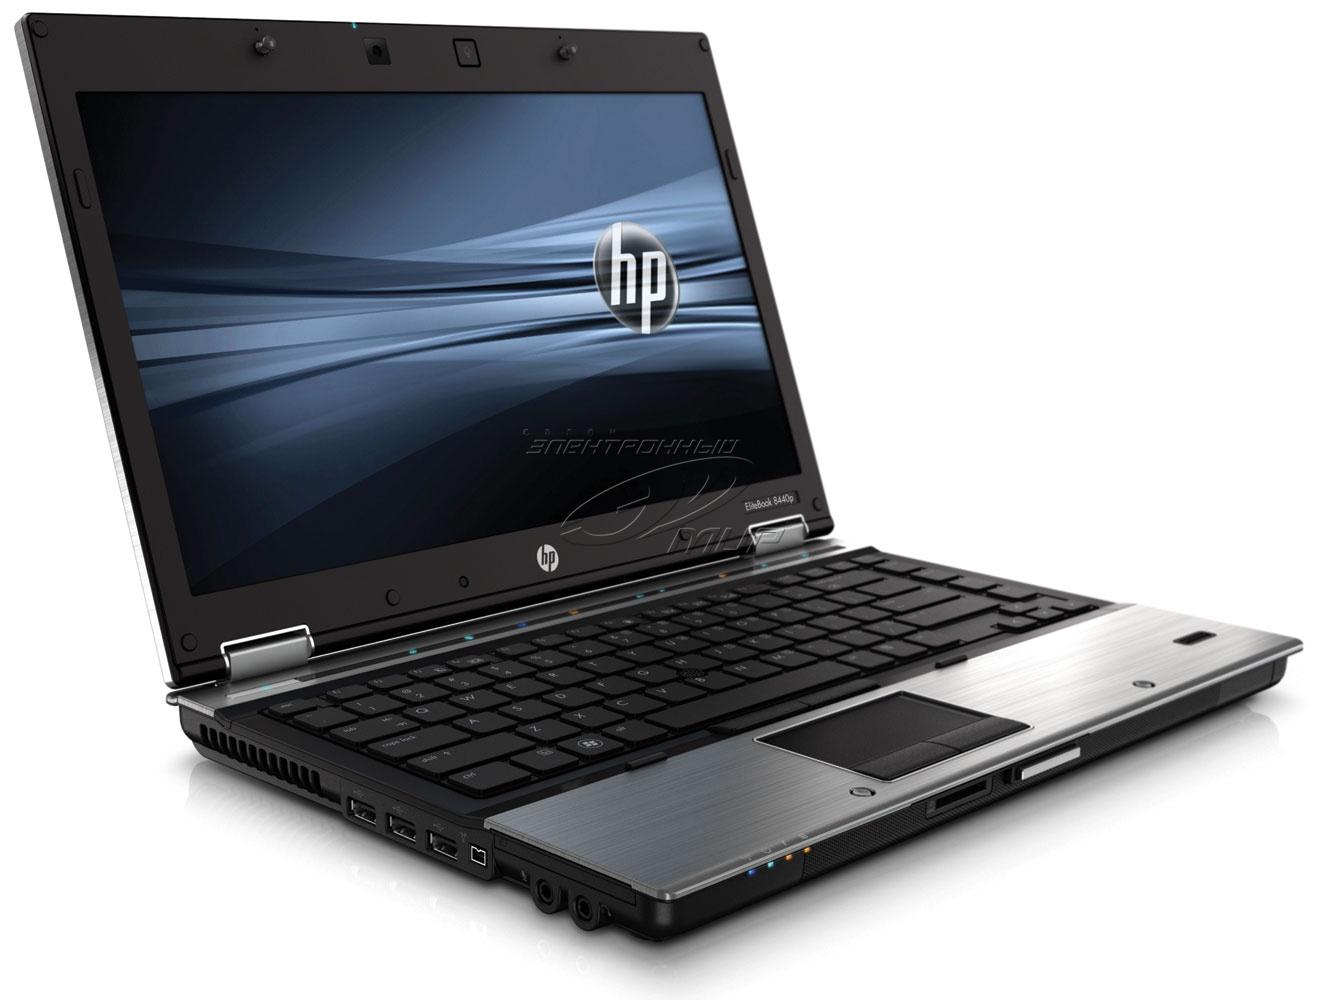 2013 Sticker Logo Intel Core I3 I5 I7 Xeon Vpro Sandy Ivy Pc Laptop Blue Silver Black